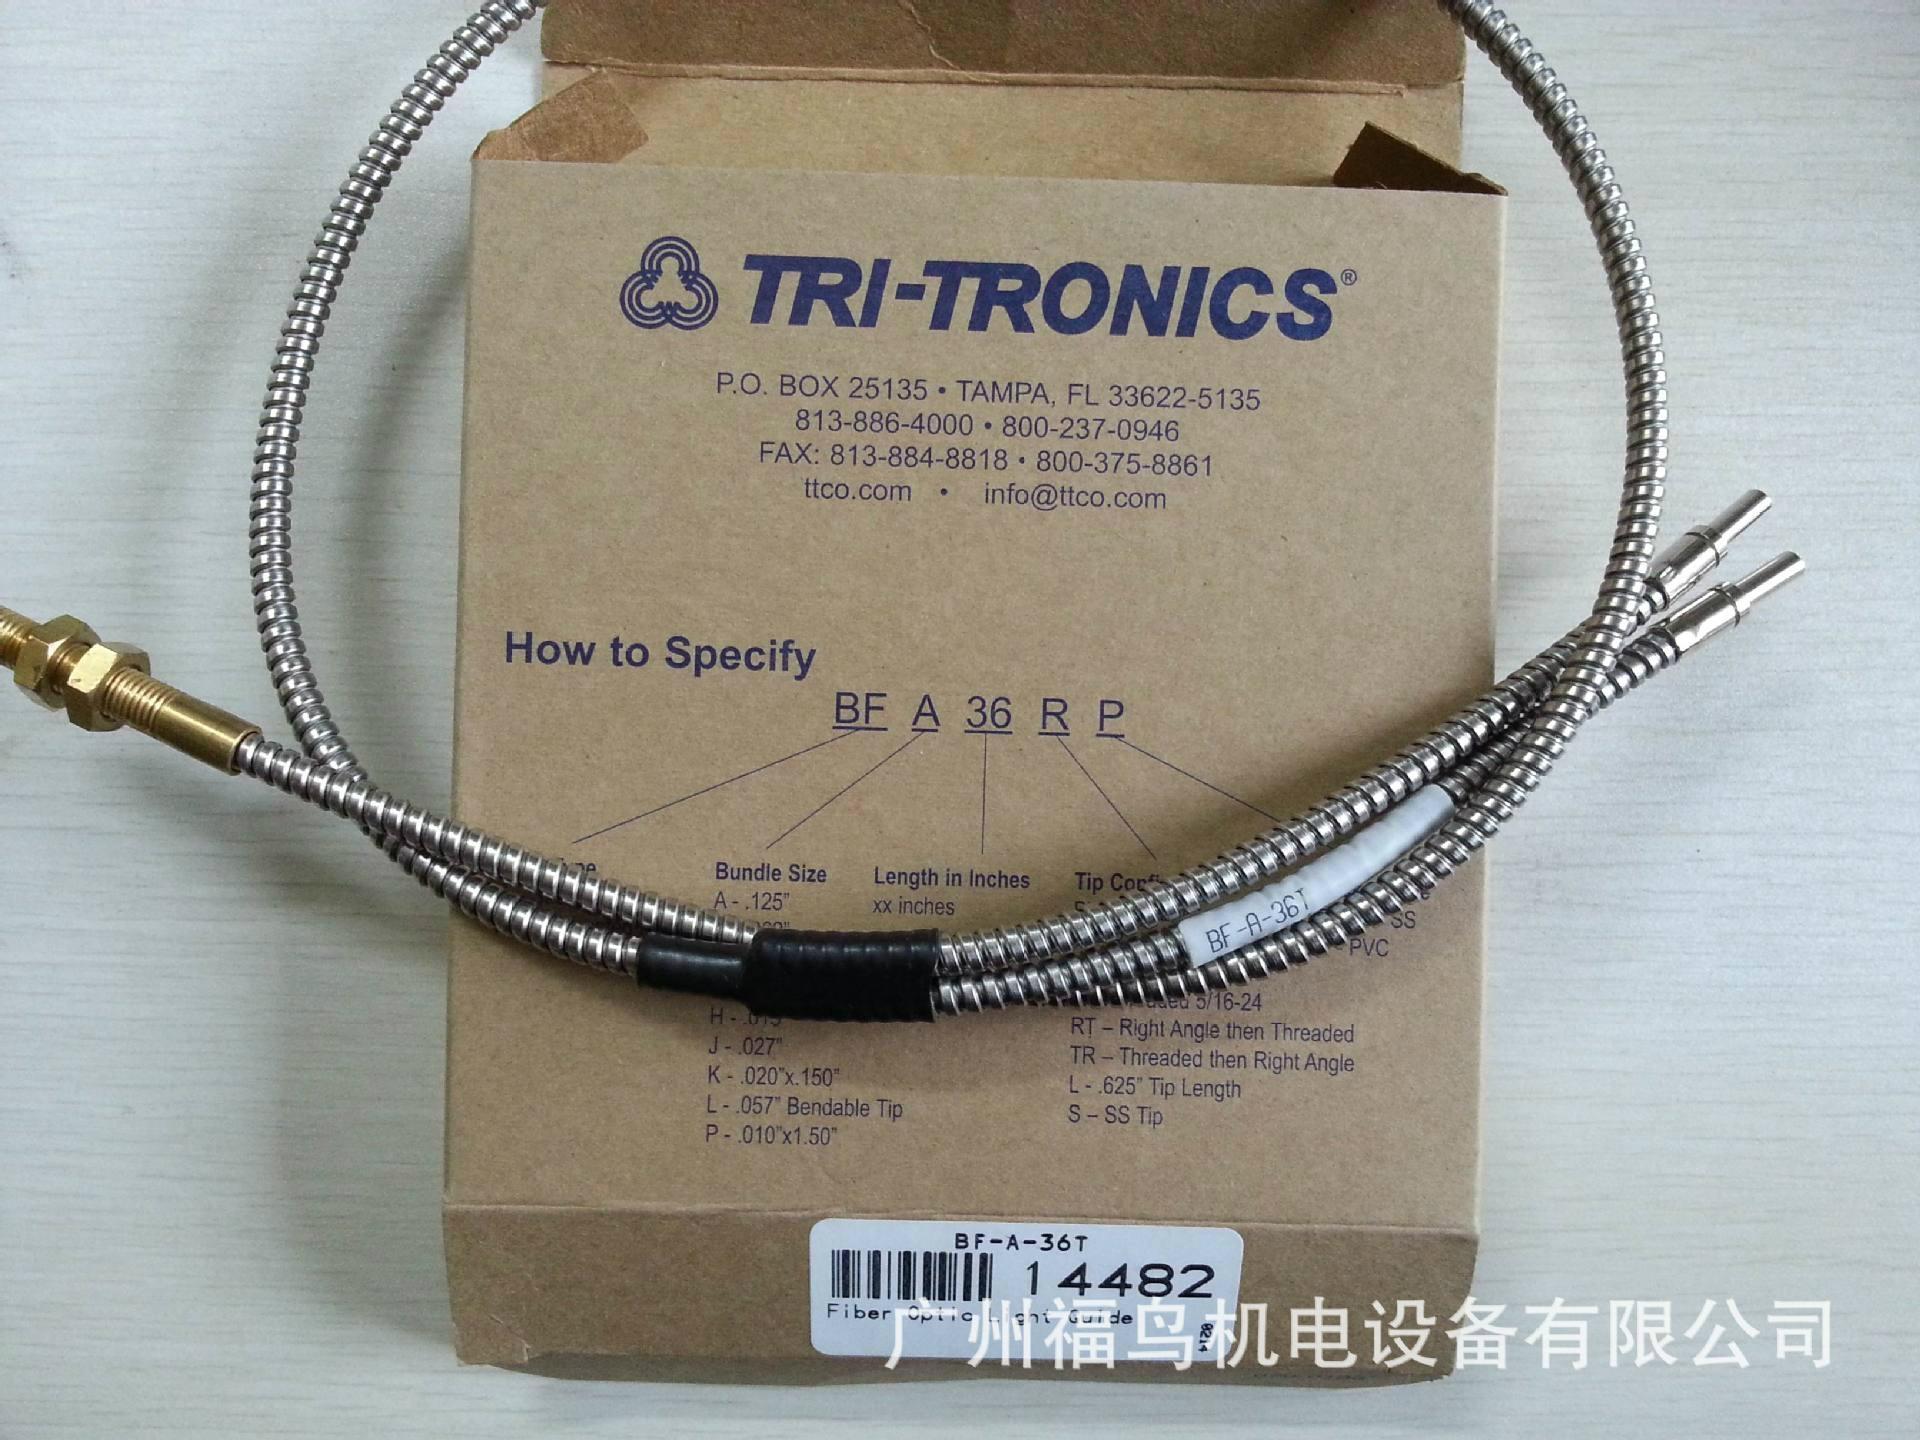 TRI-TRONICS光纖, 型號: BF-A-36T